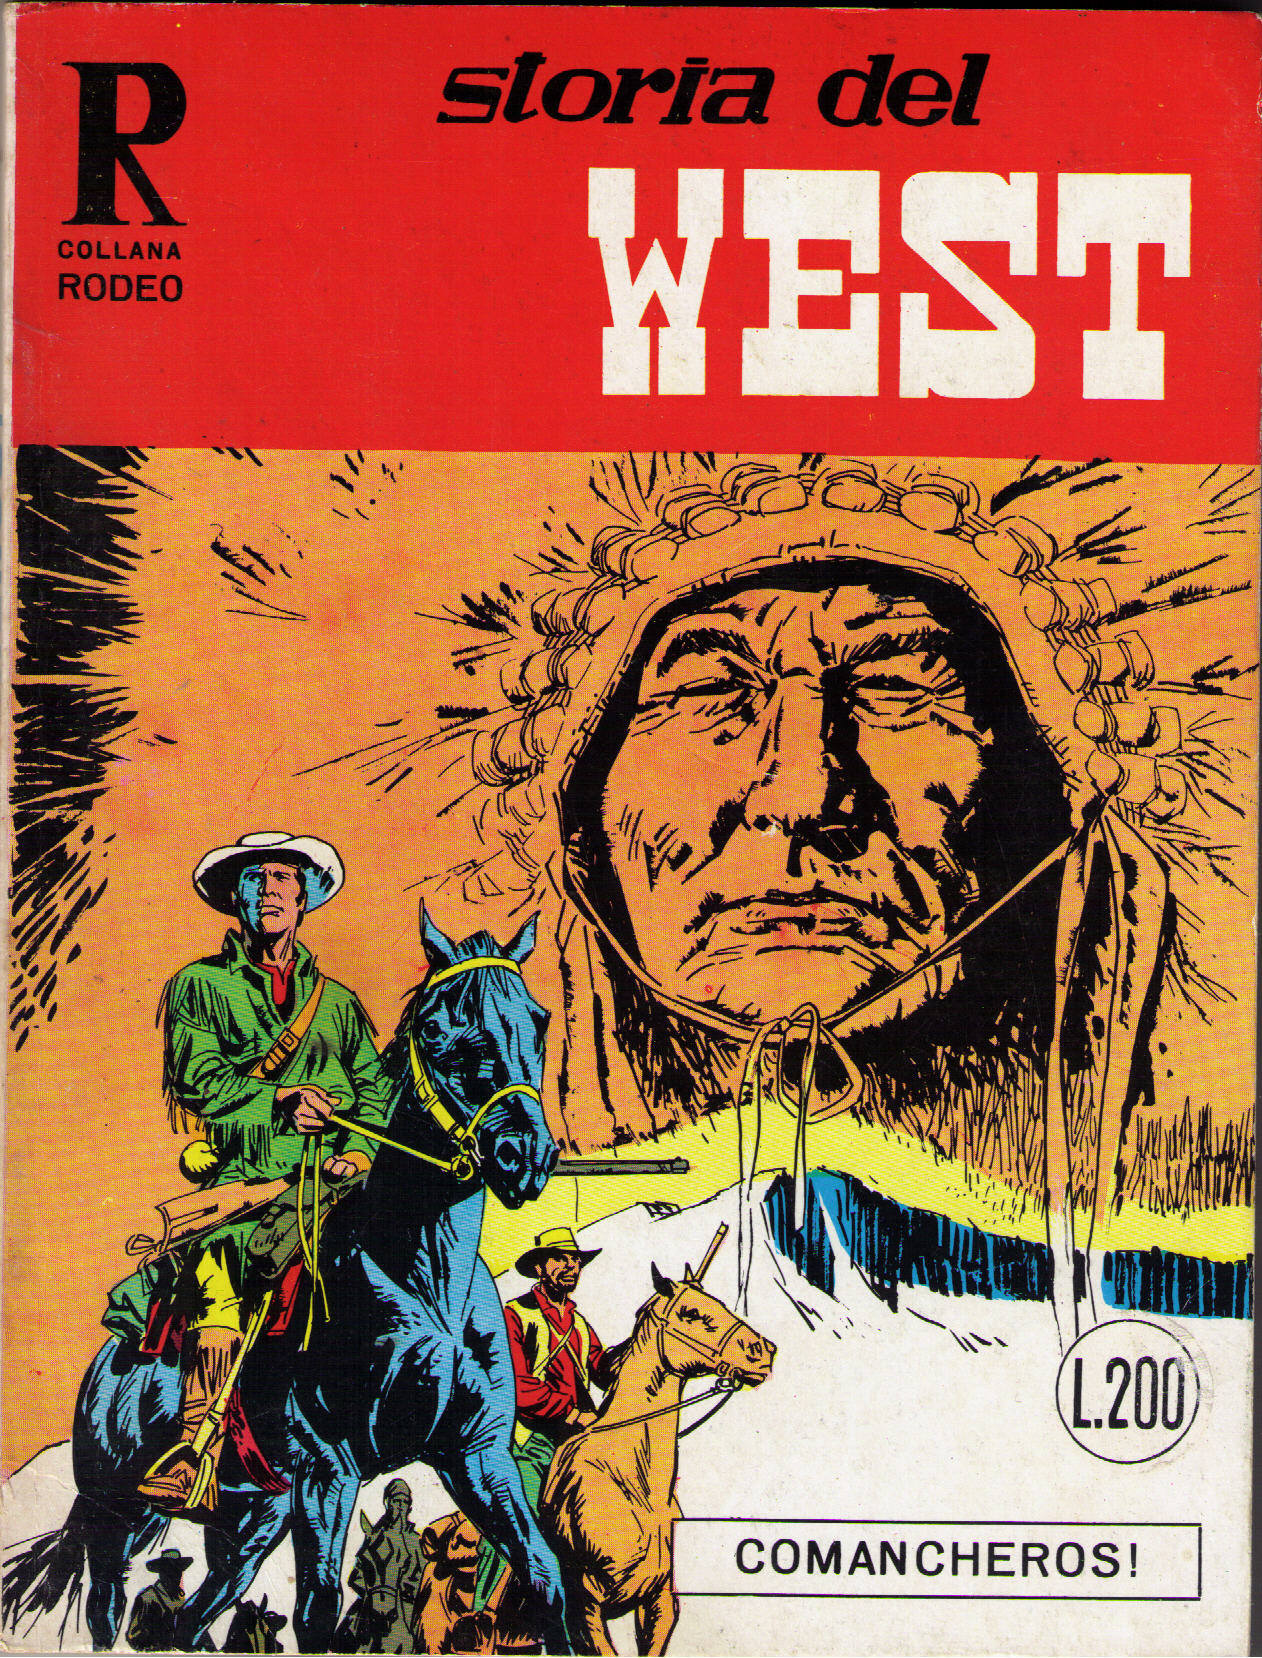 Storia del west n. 4 (Collana Rodeo n. 4)